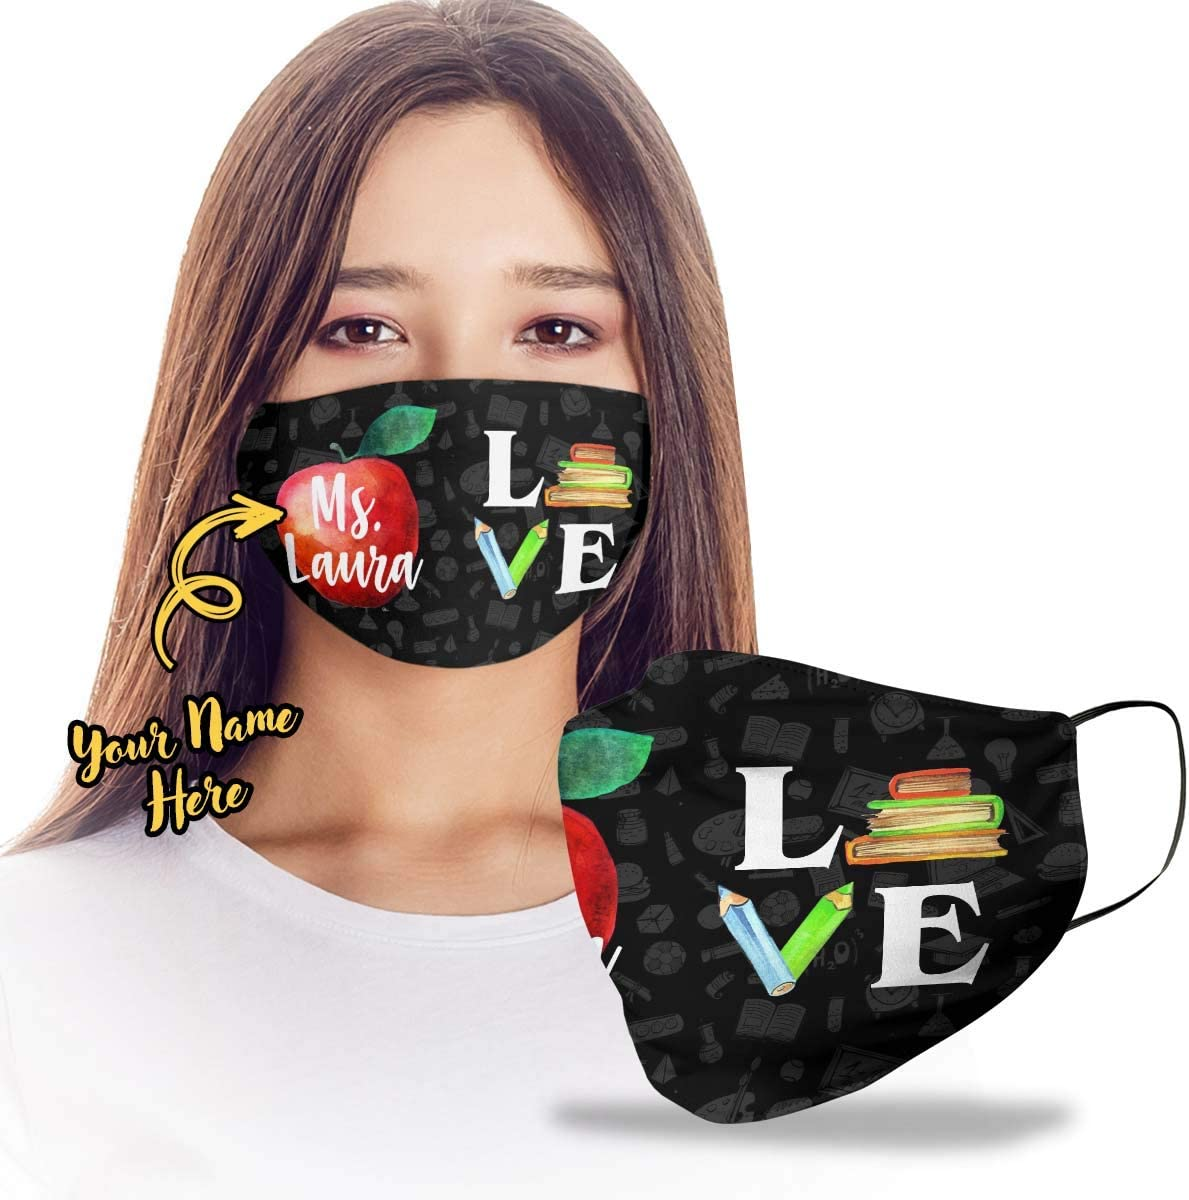 Personalized Mask